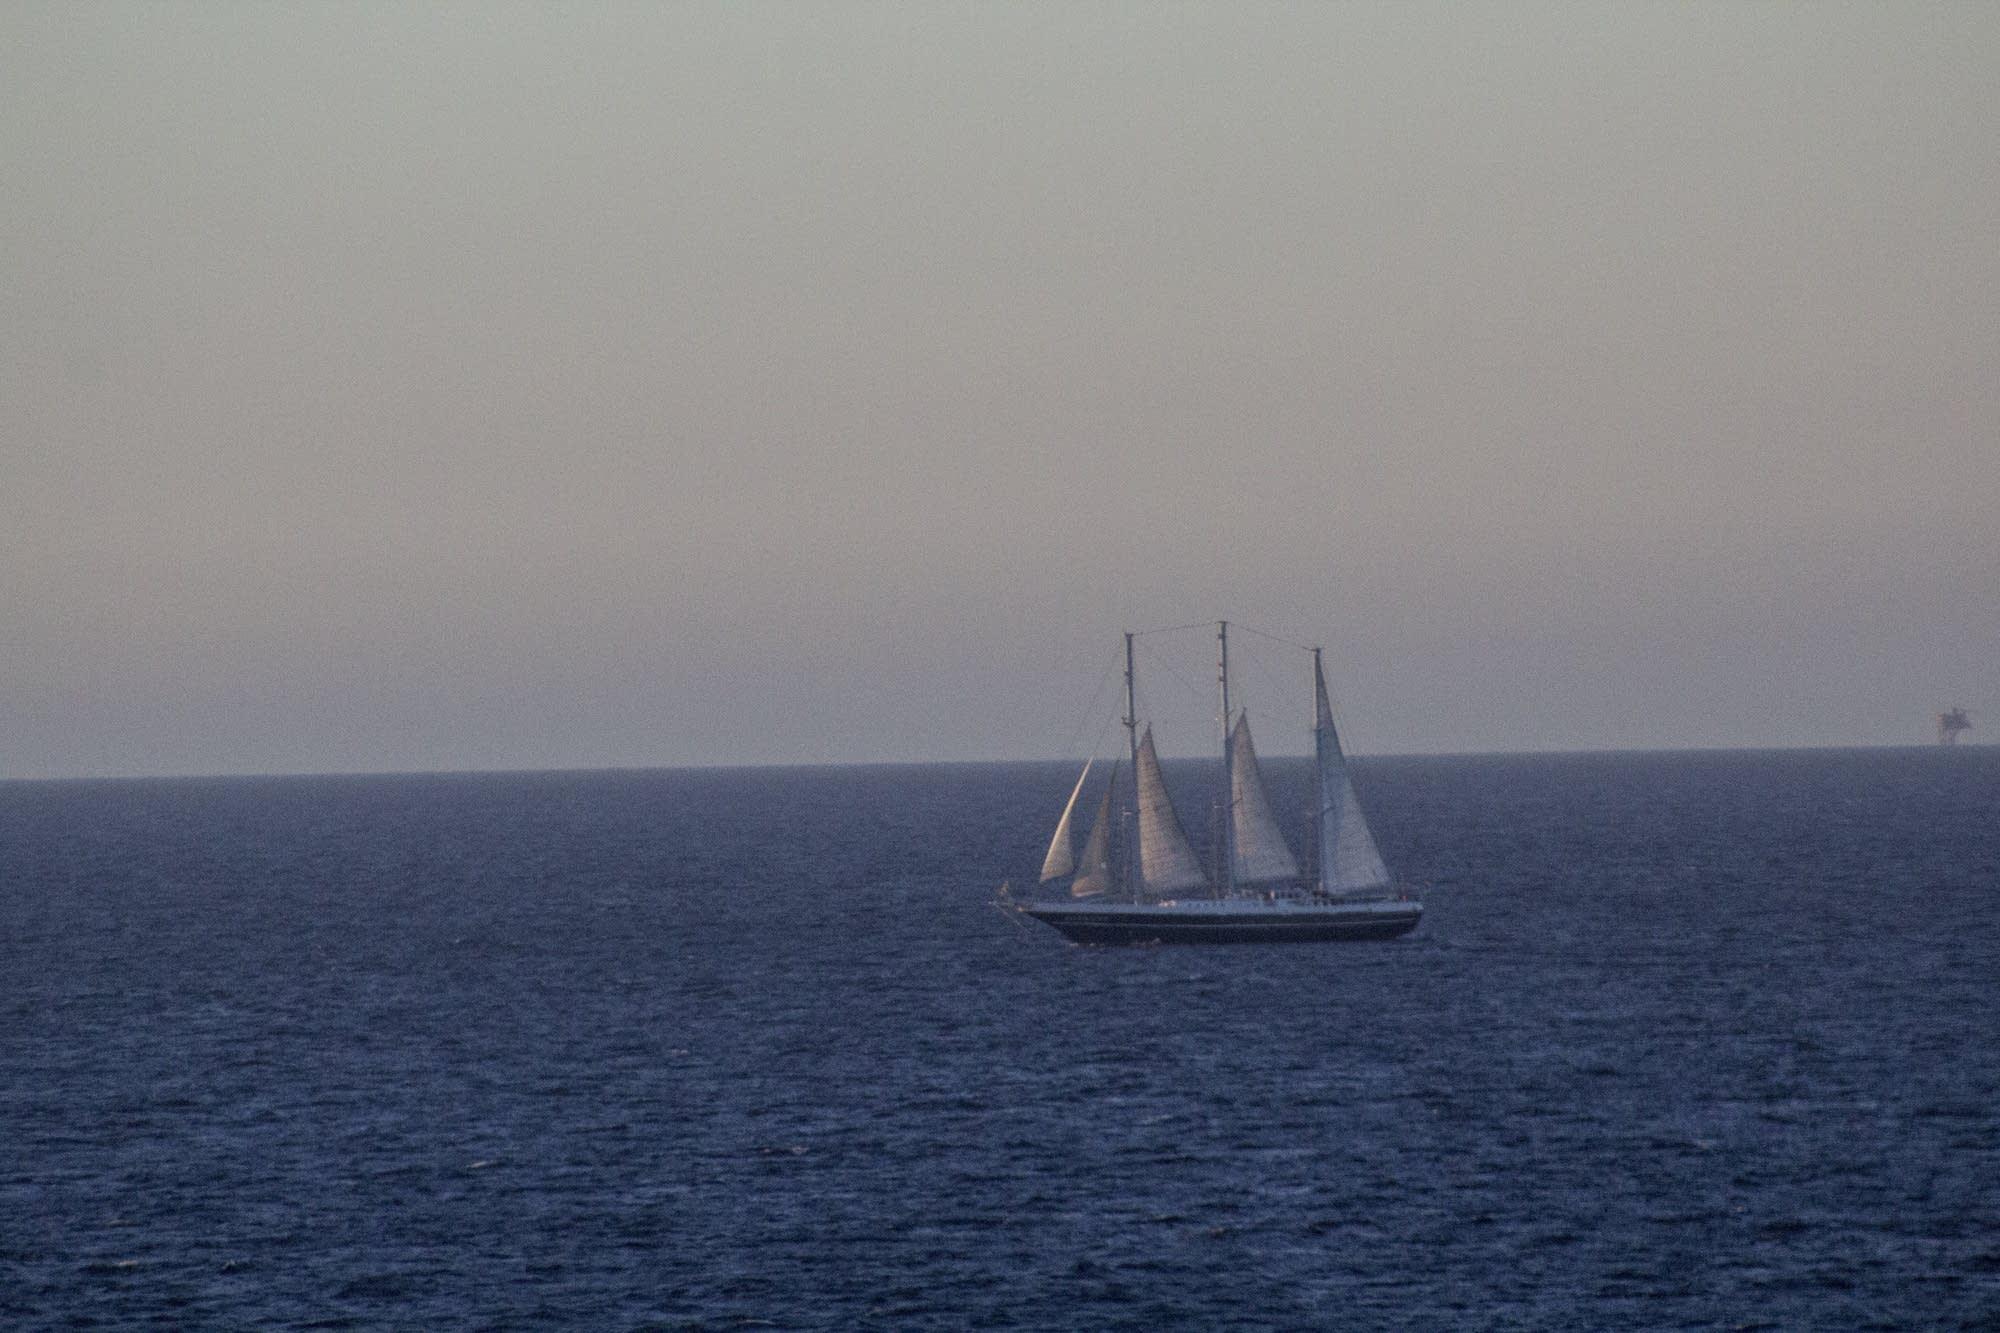 Leaving Rotterdam - tall ship